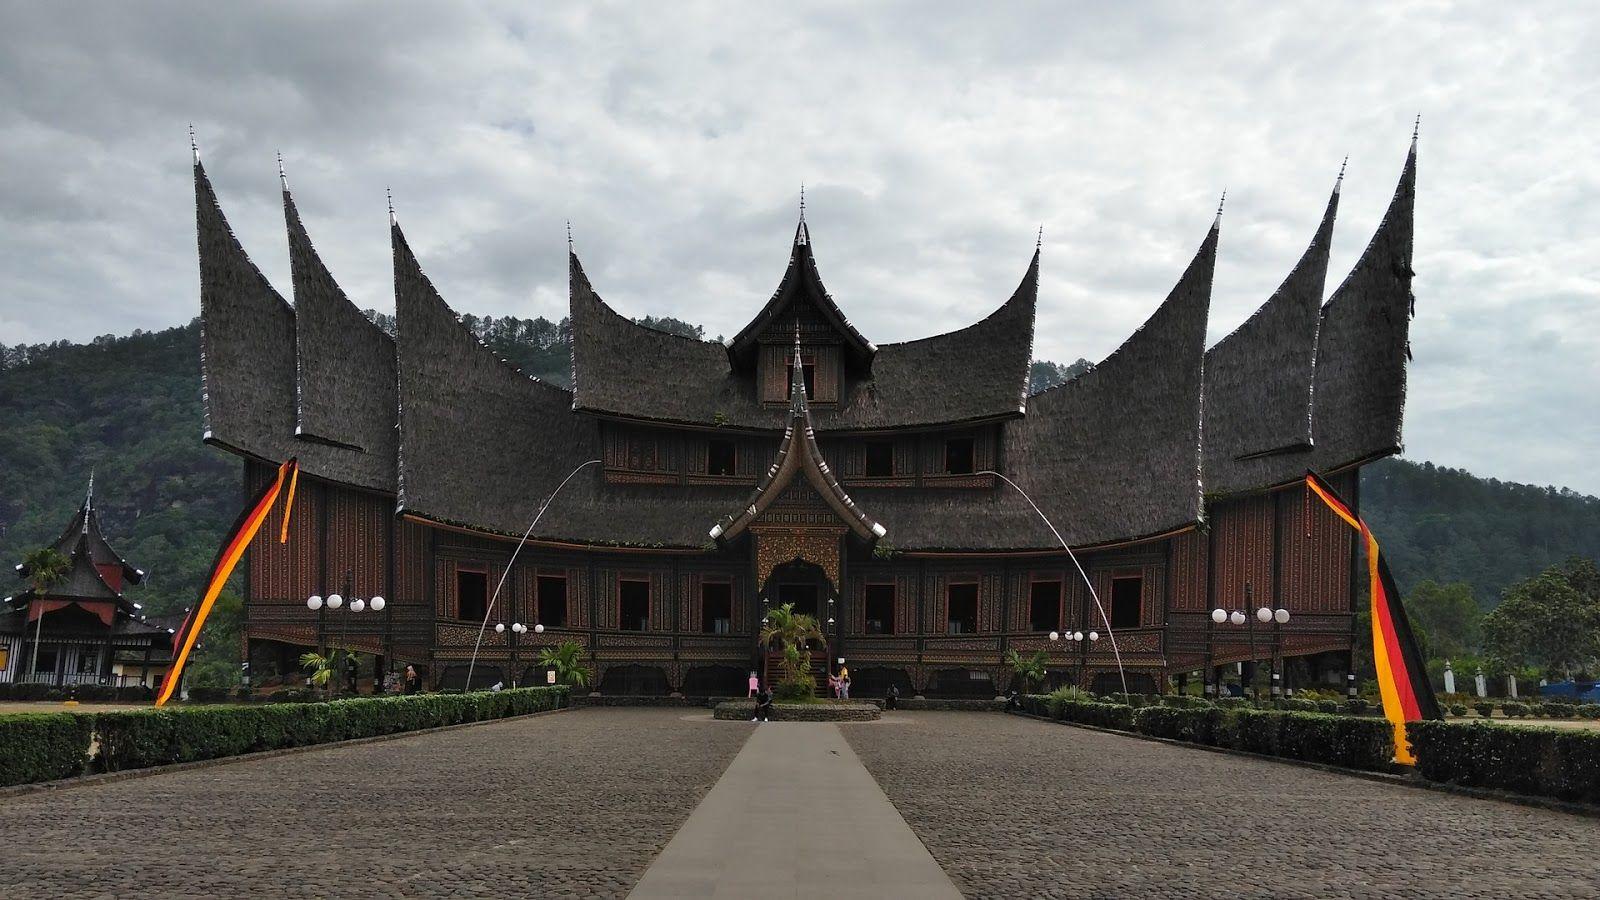 Sumatera Utara Memiliki Rumah Adat Yang Begitu Mempesona